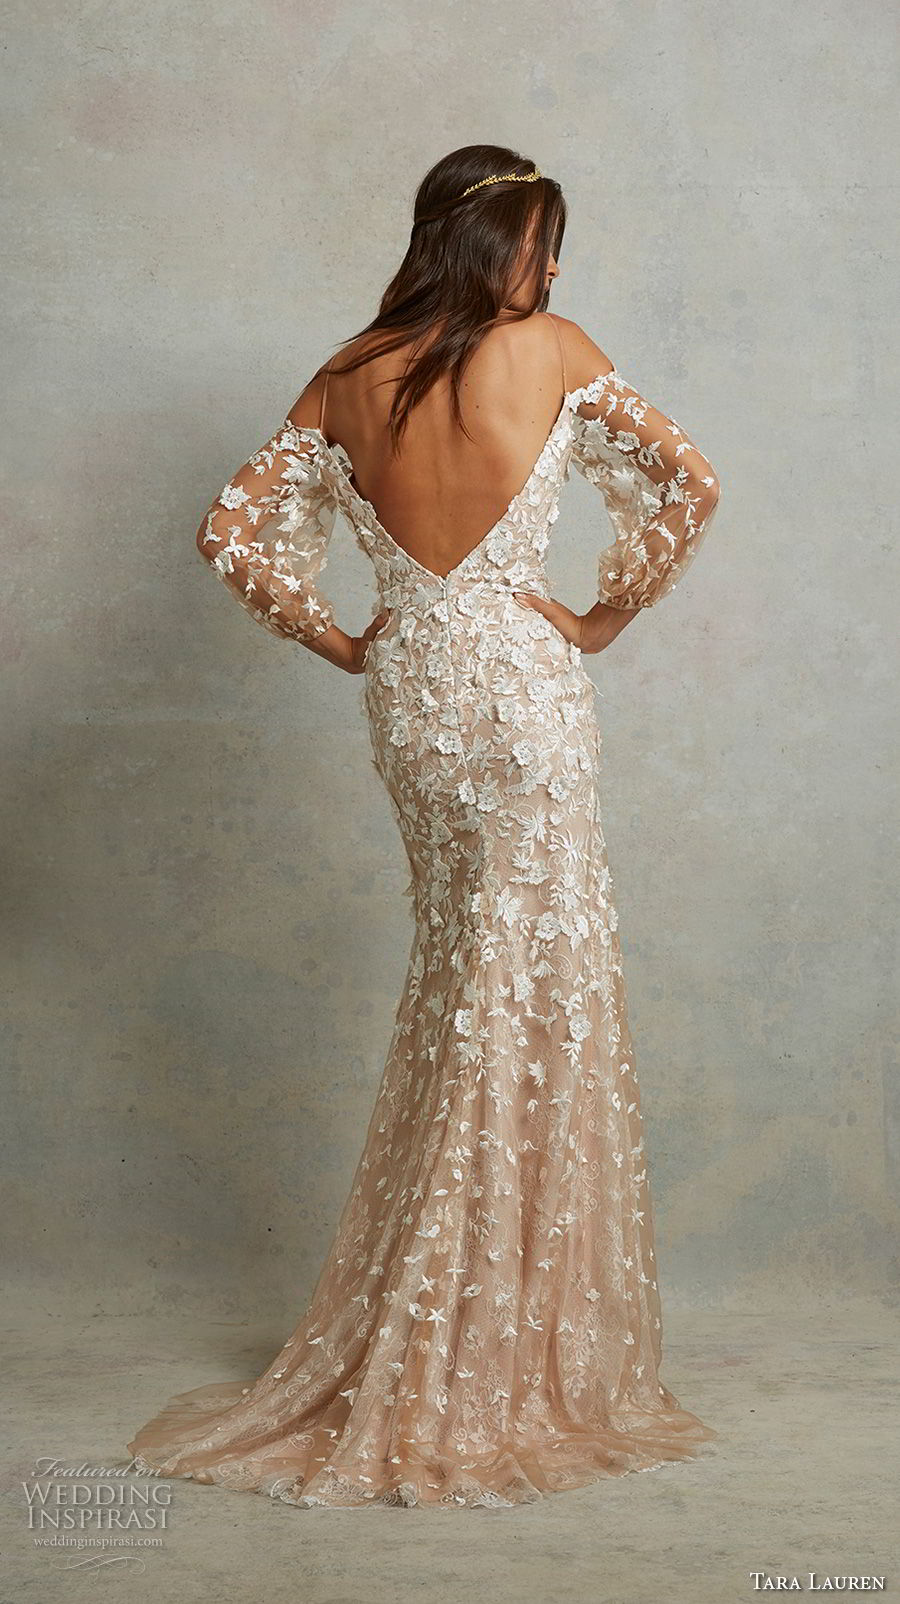 tara lauren spring 2018 bridal spaghetti strap long bishop sleeves sweetheart neckline full embellishment elegant champagne fit and flare wedding dress v back sweep train (10) bv